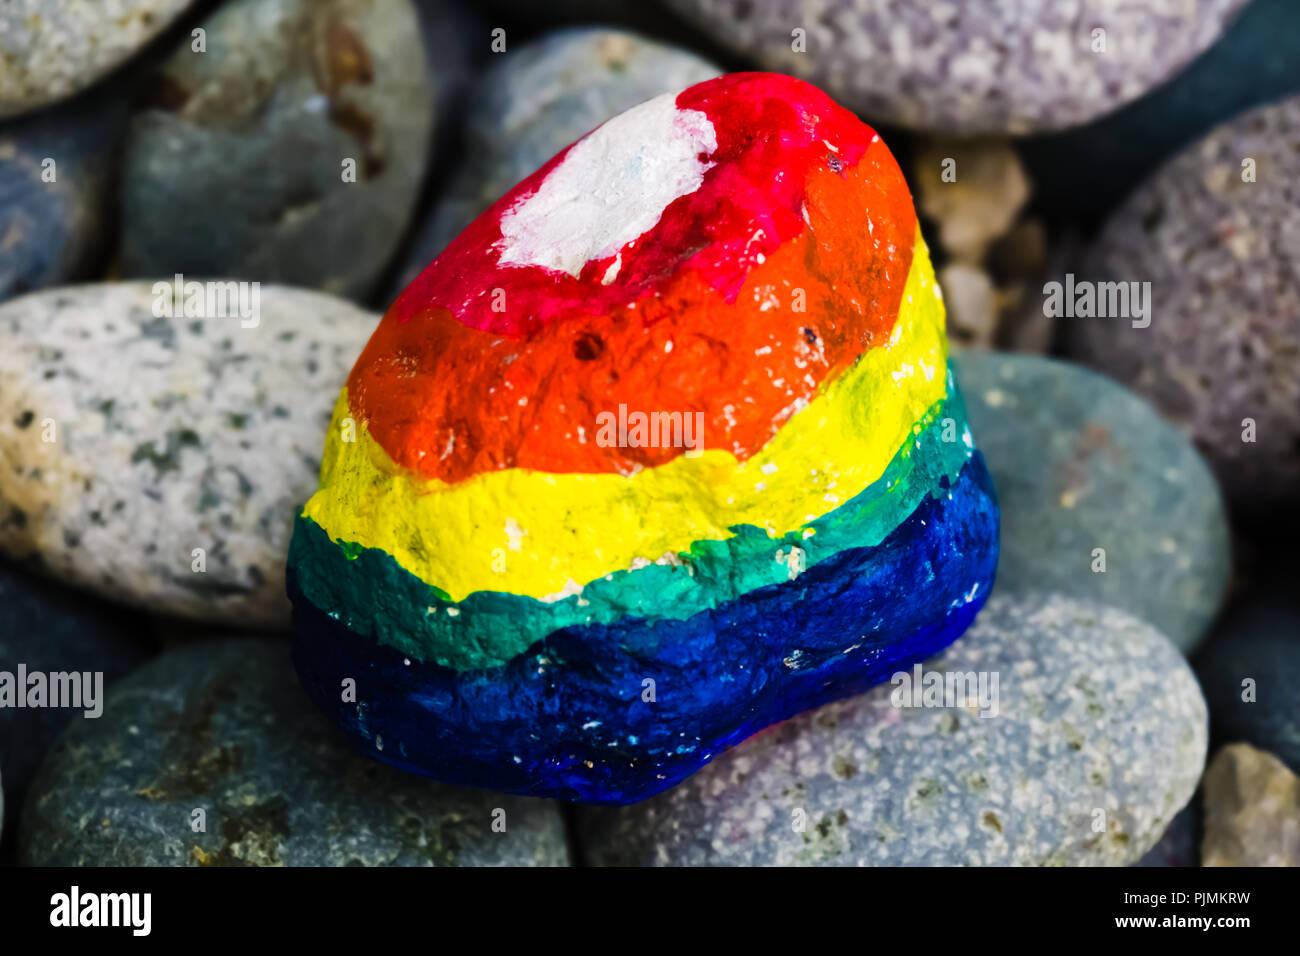 Stone painting - Rainbow Colors - Stock Image